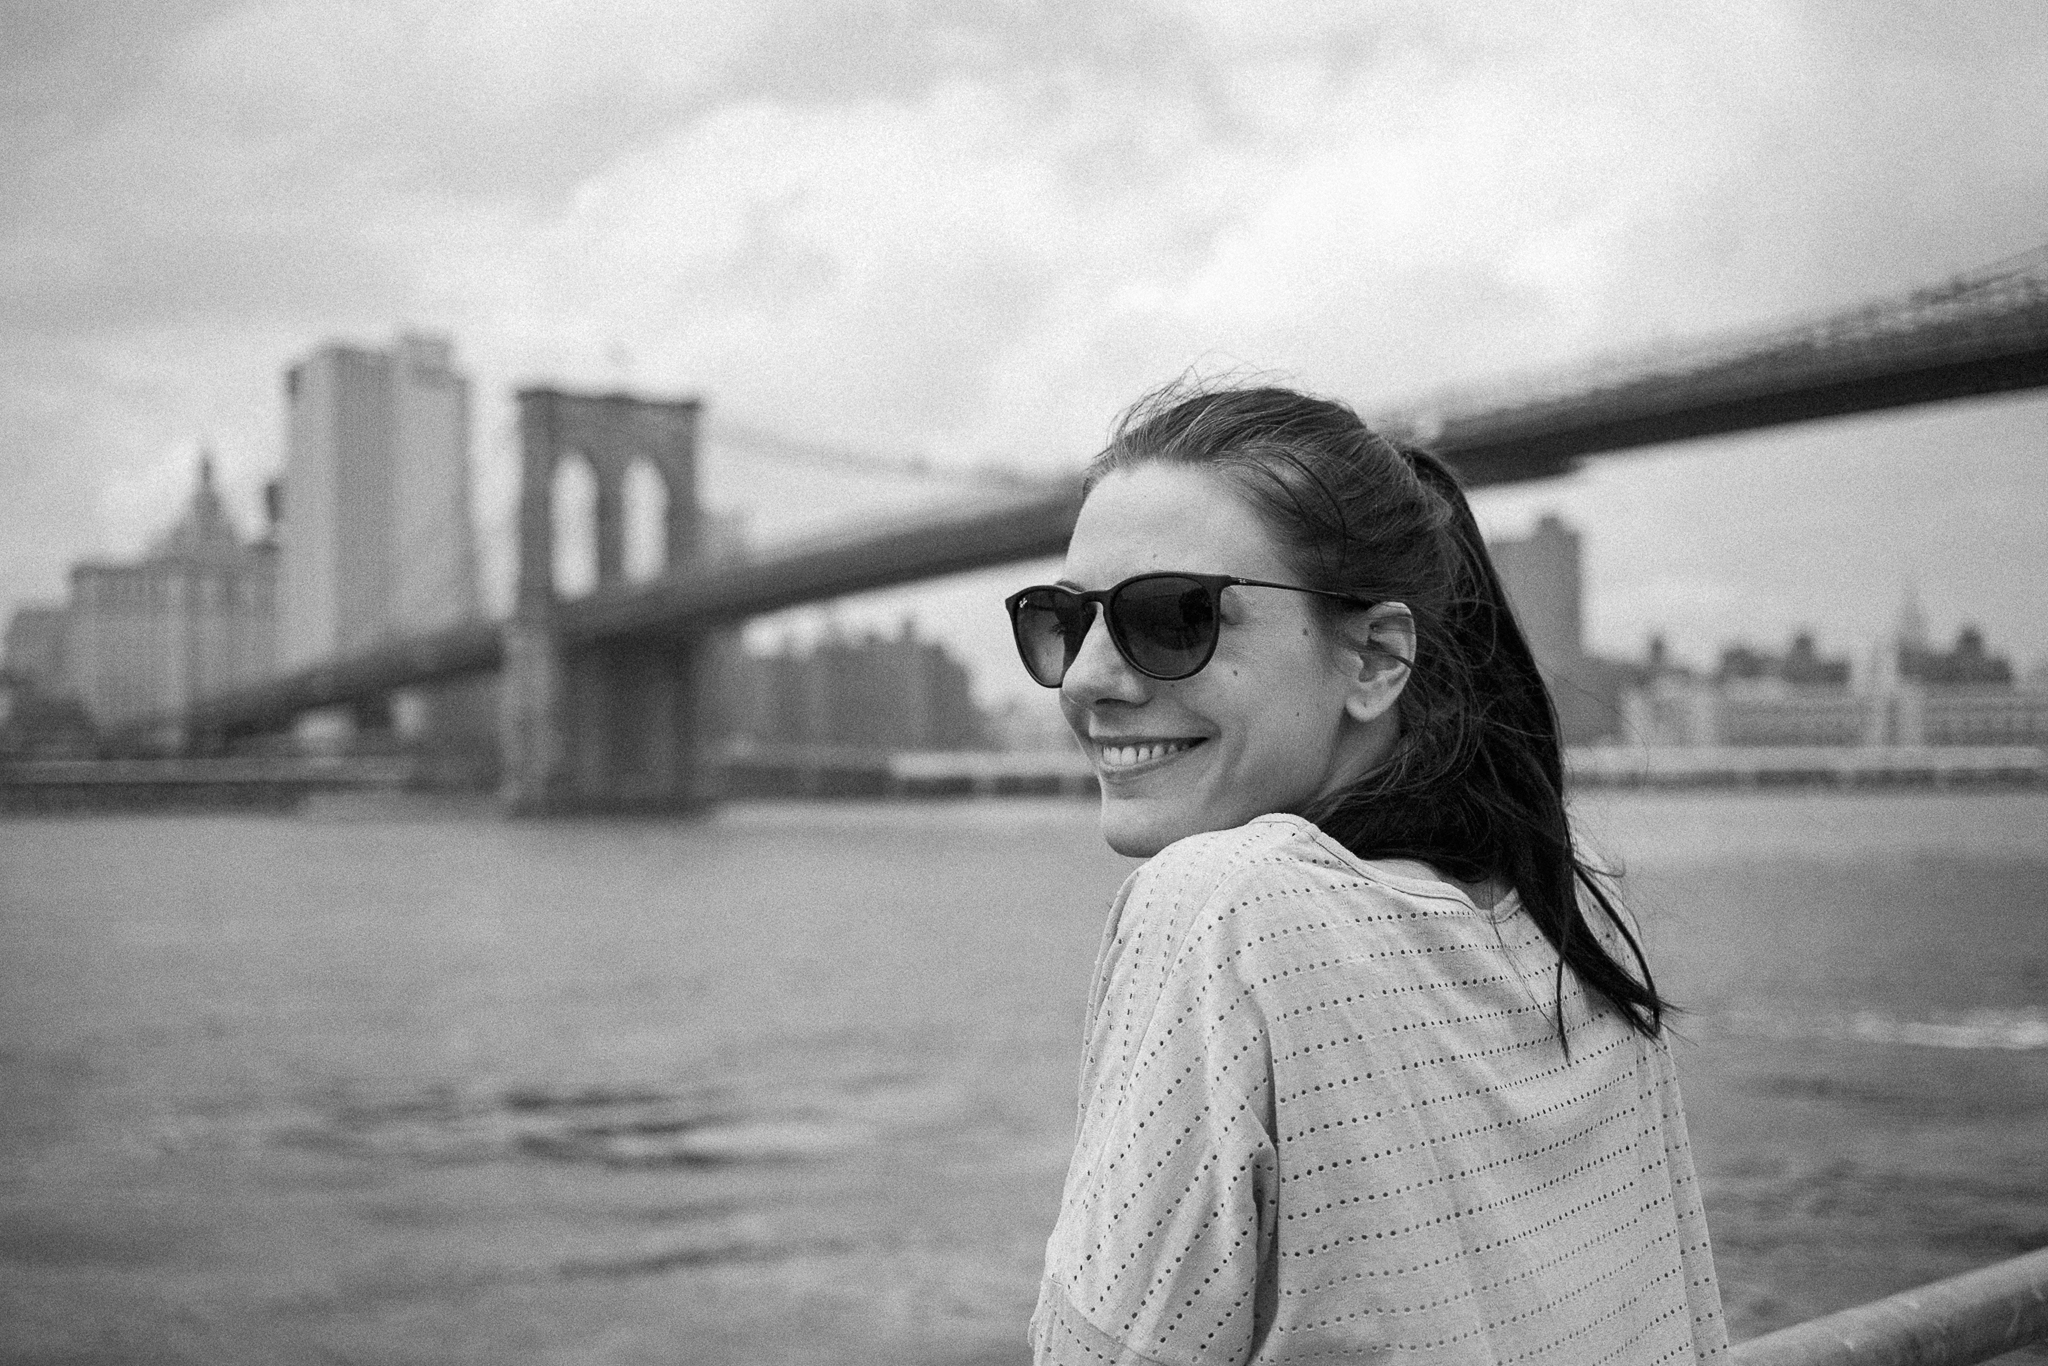 2015-05-14-NYC-1048.jpg